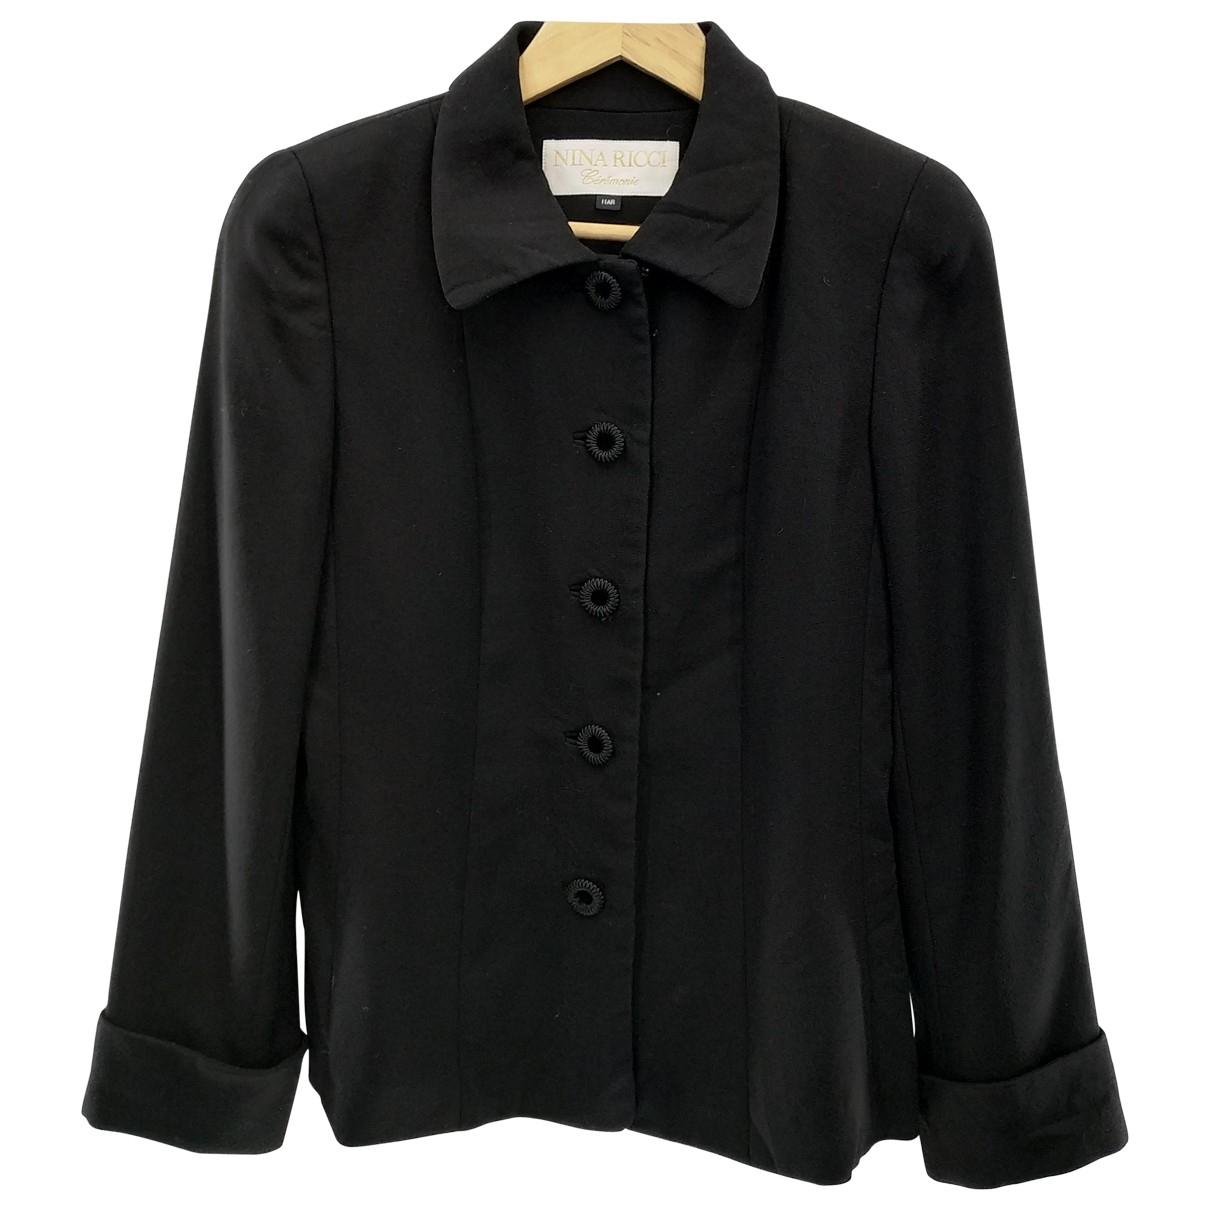 Nina Ricci \N Black coat for Women S International